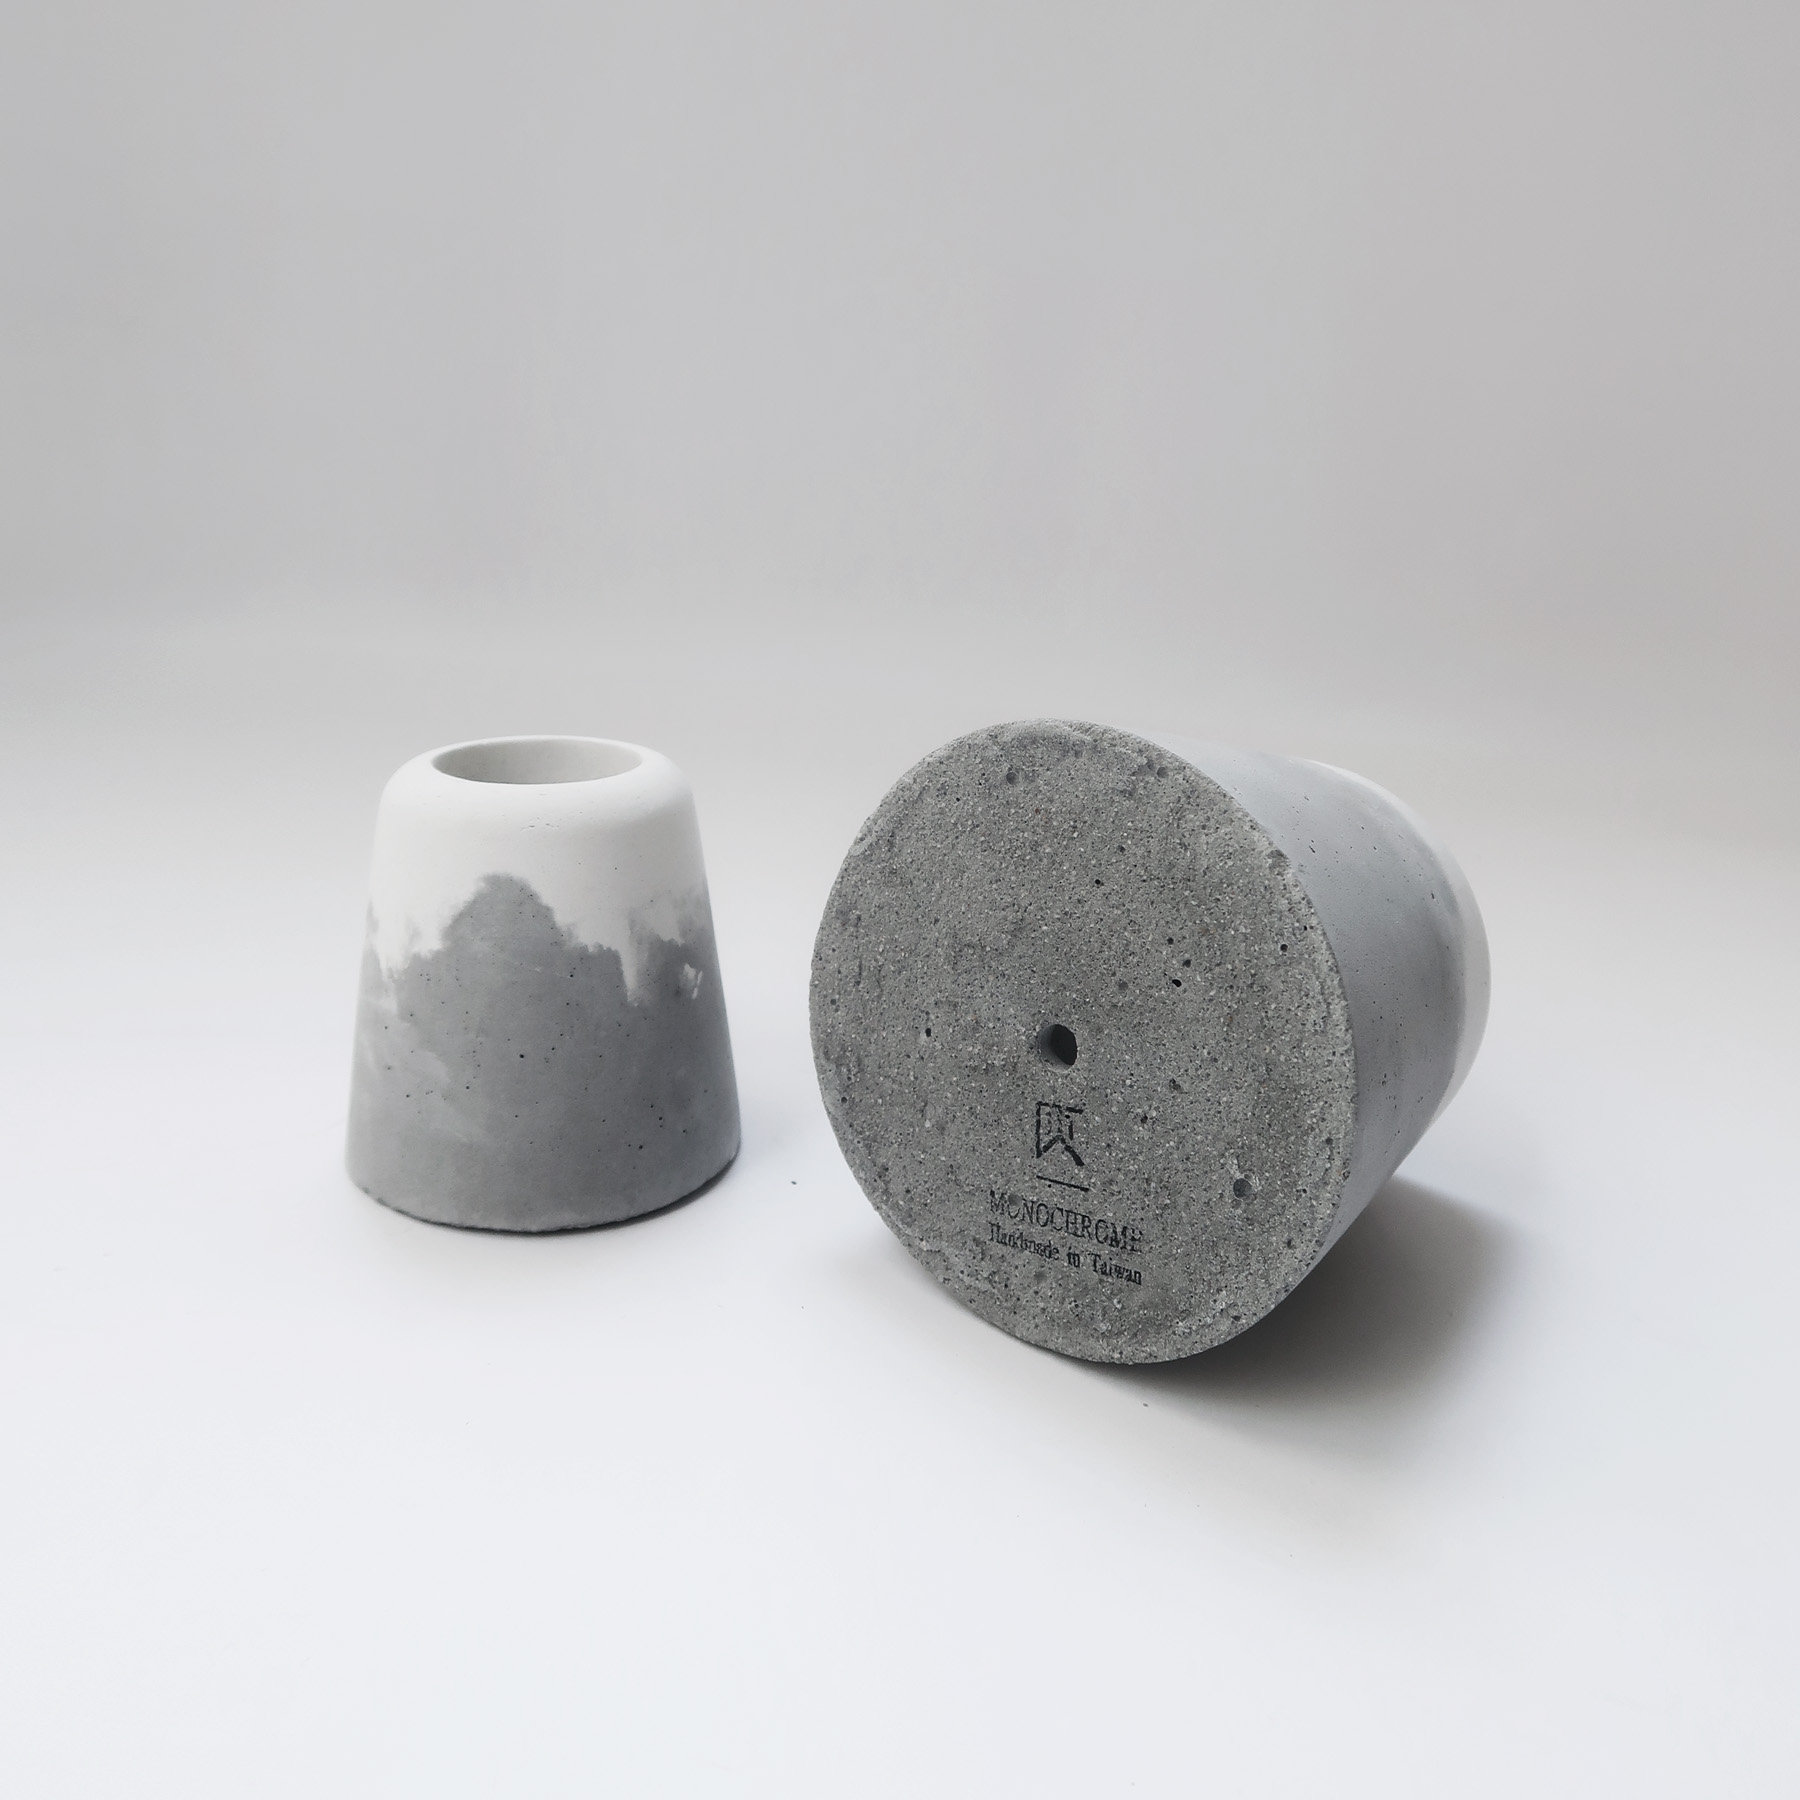 SNOW VOLCAN 大雪火山水泥設計盆器・盆栽・花器